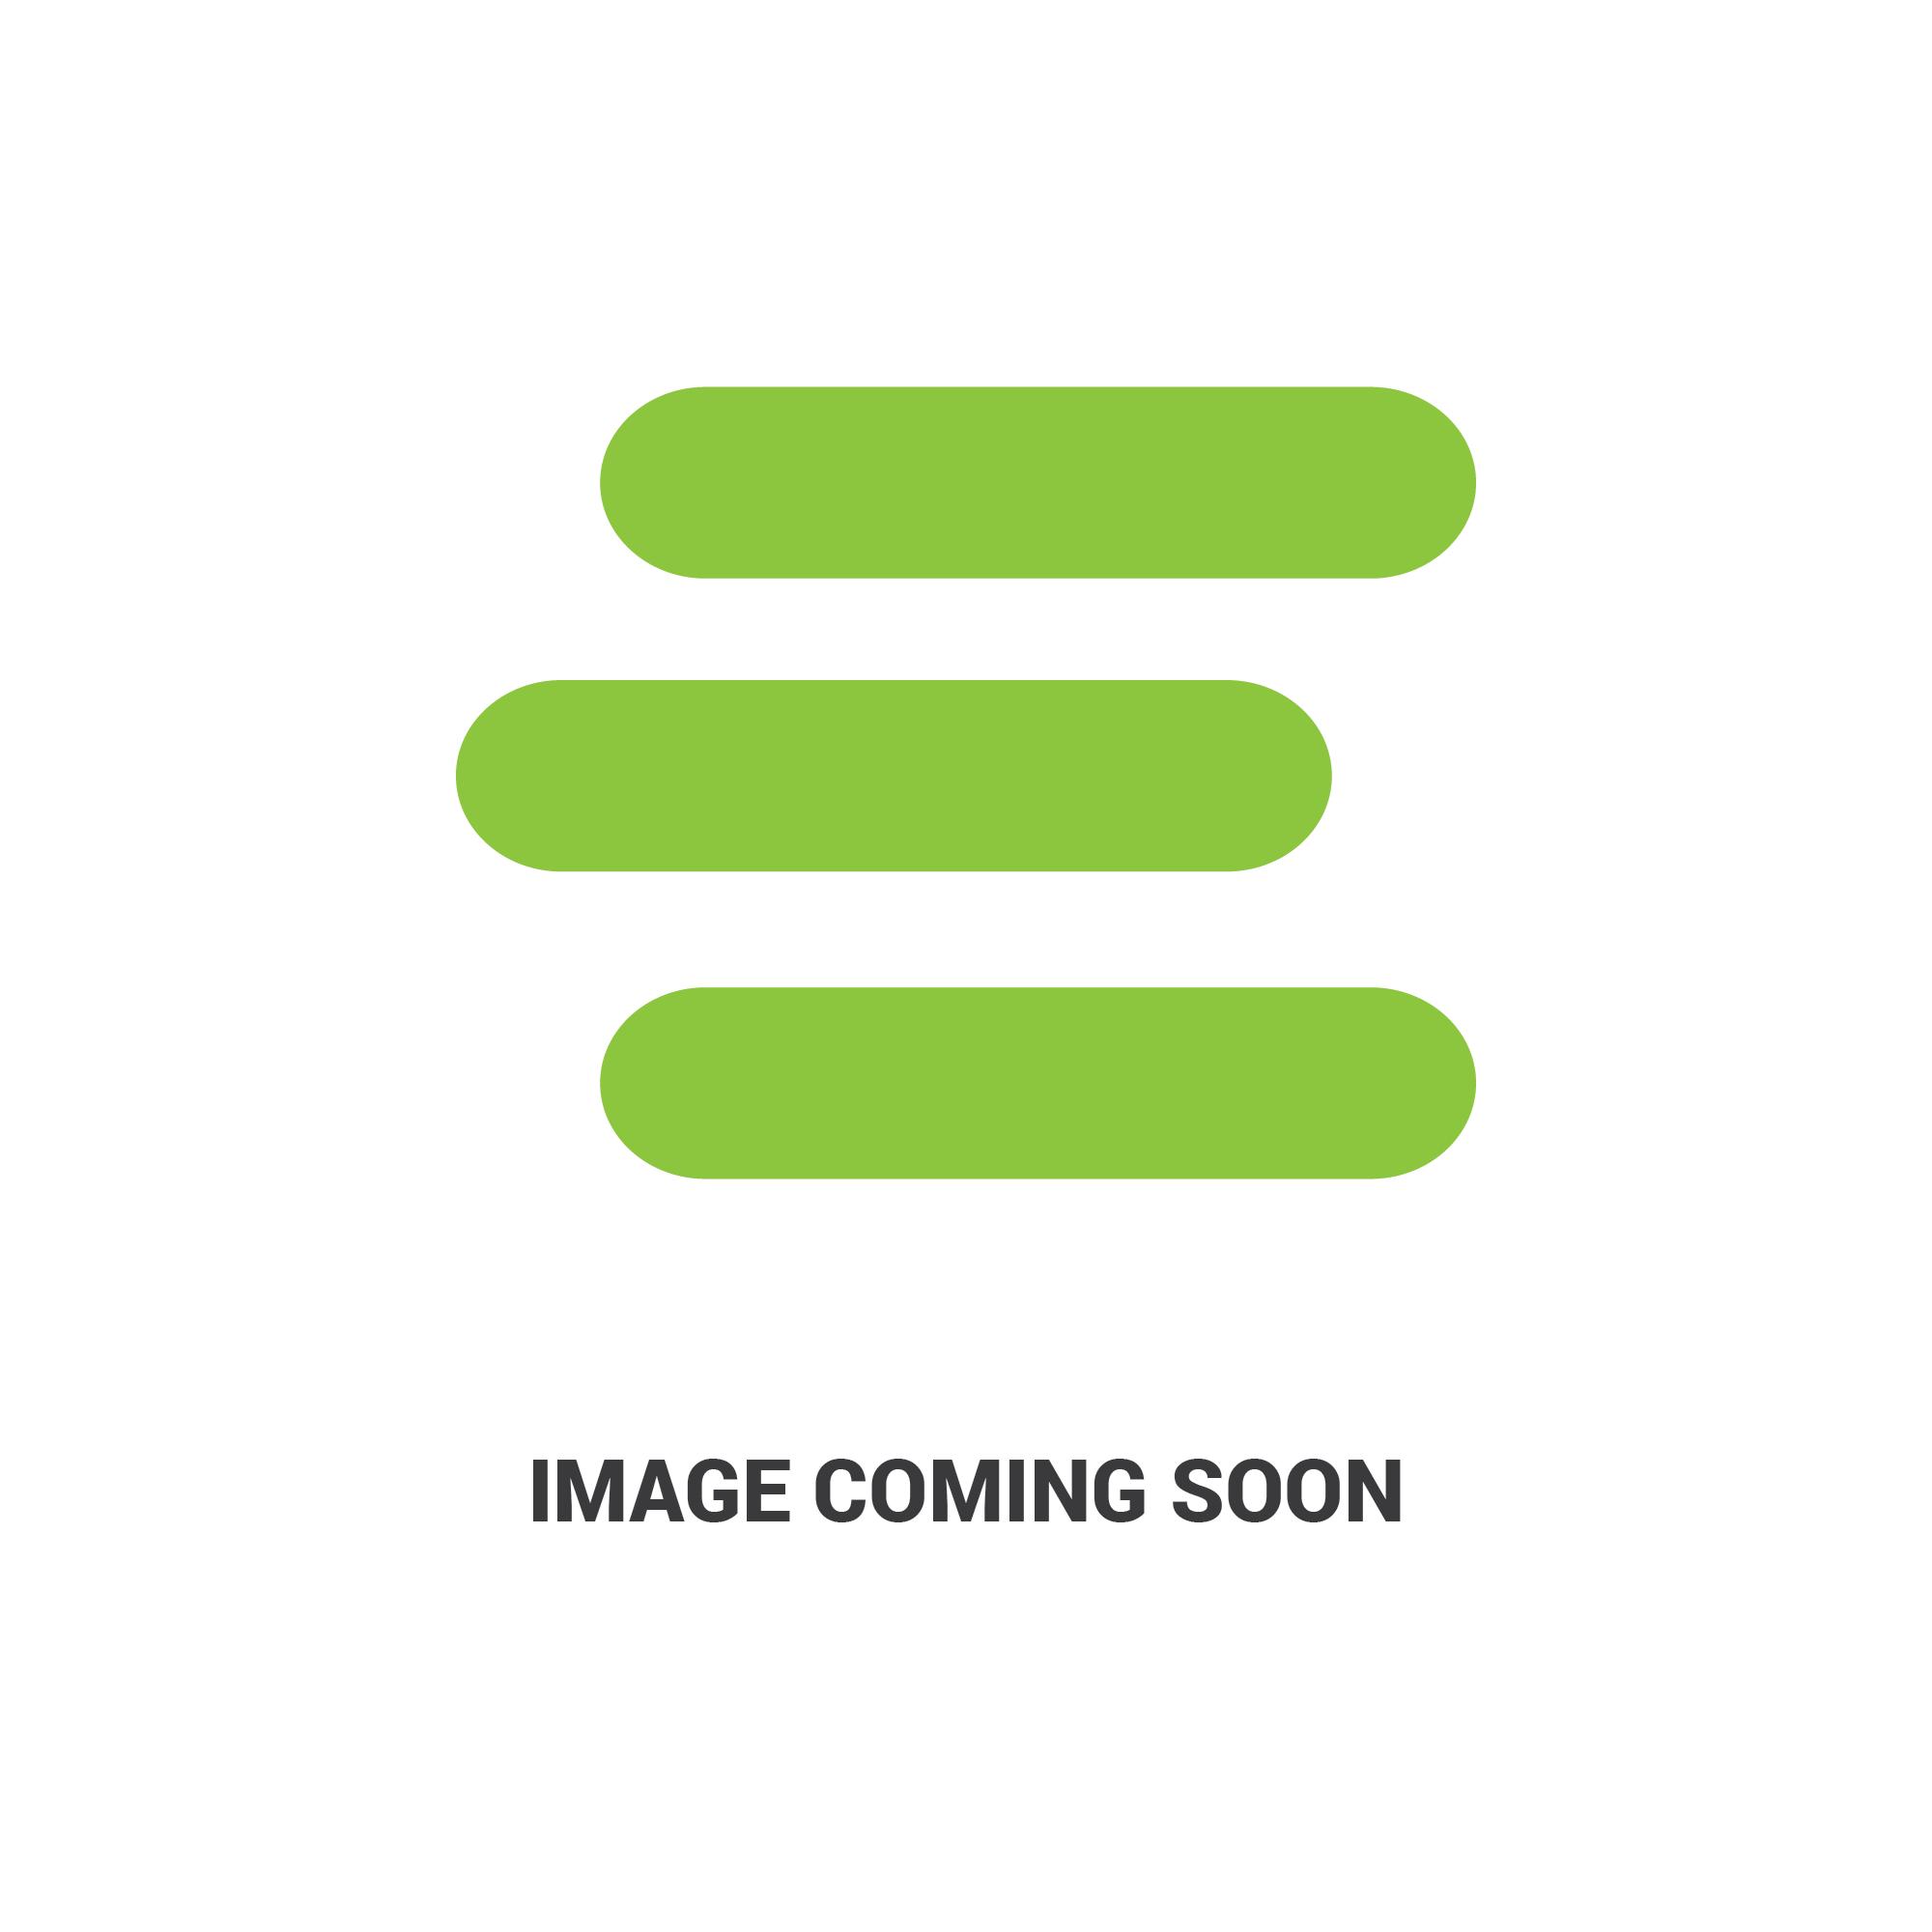 E-66751771117_1.jpg